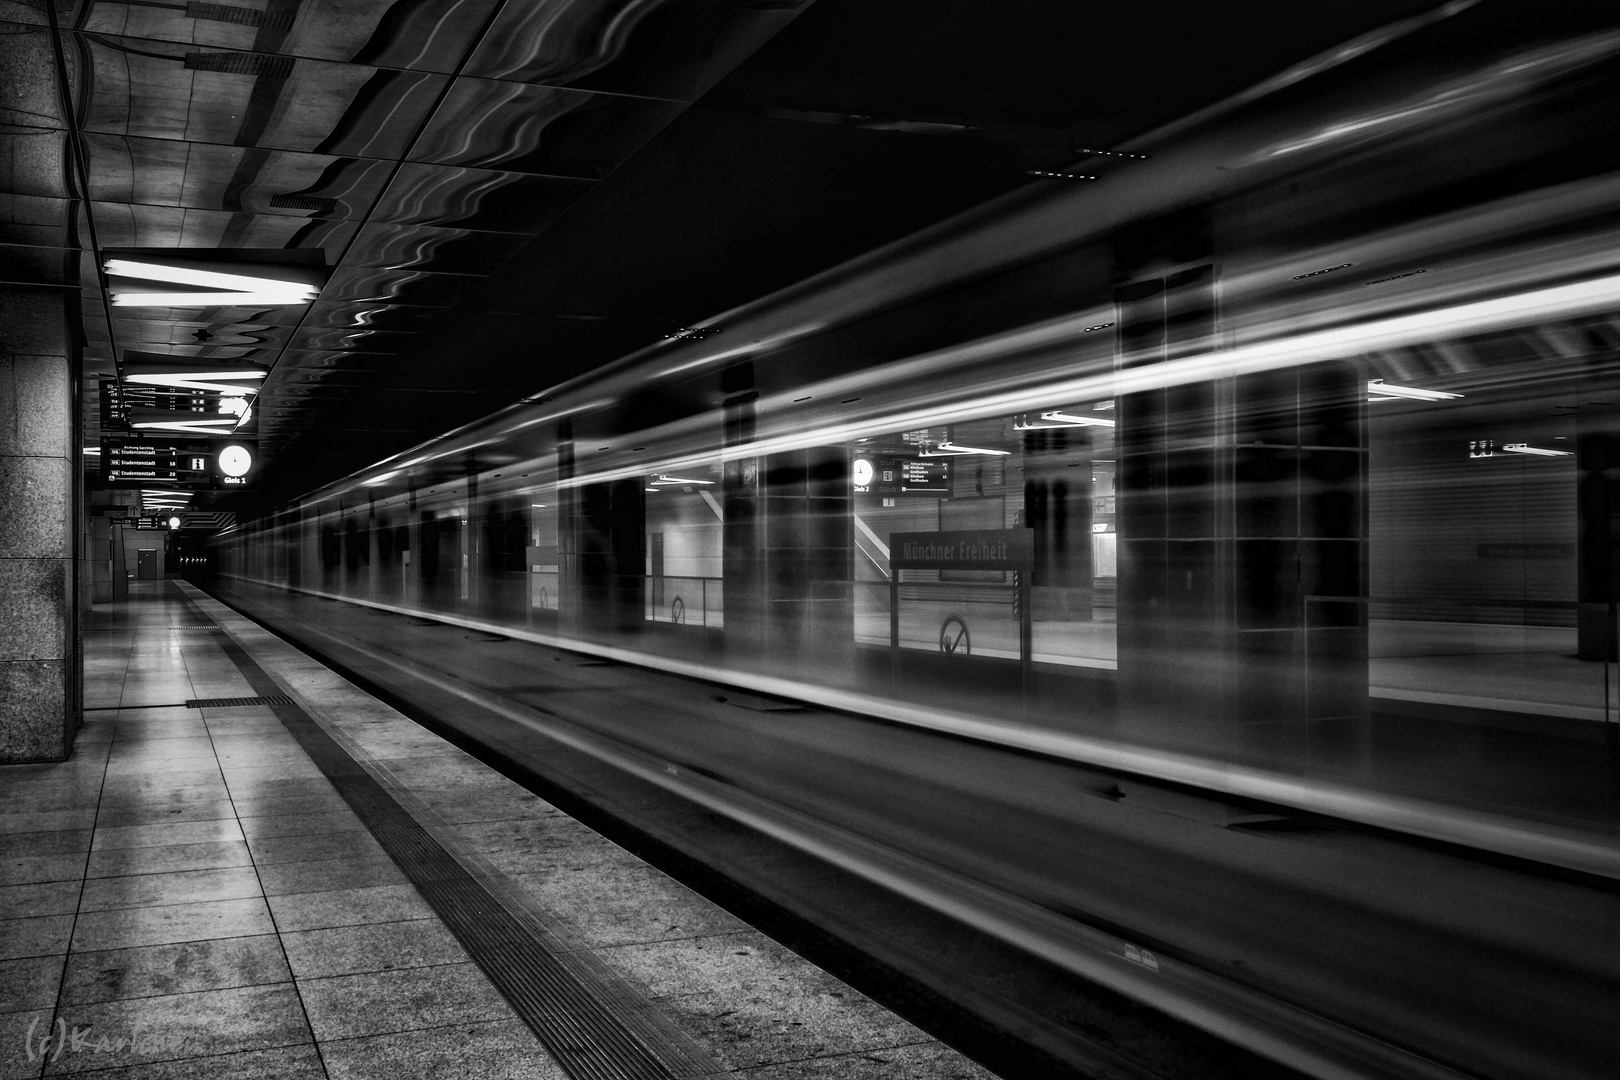 -Geisterzug auf Gleis 1-